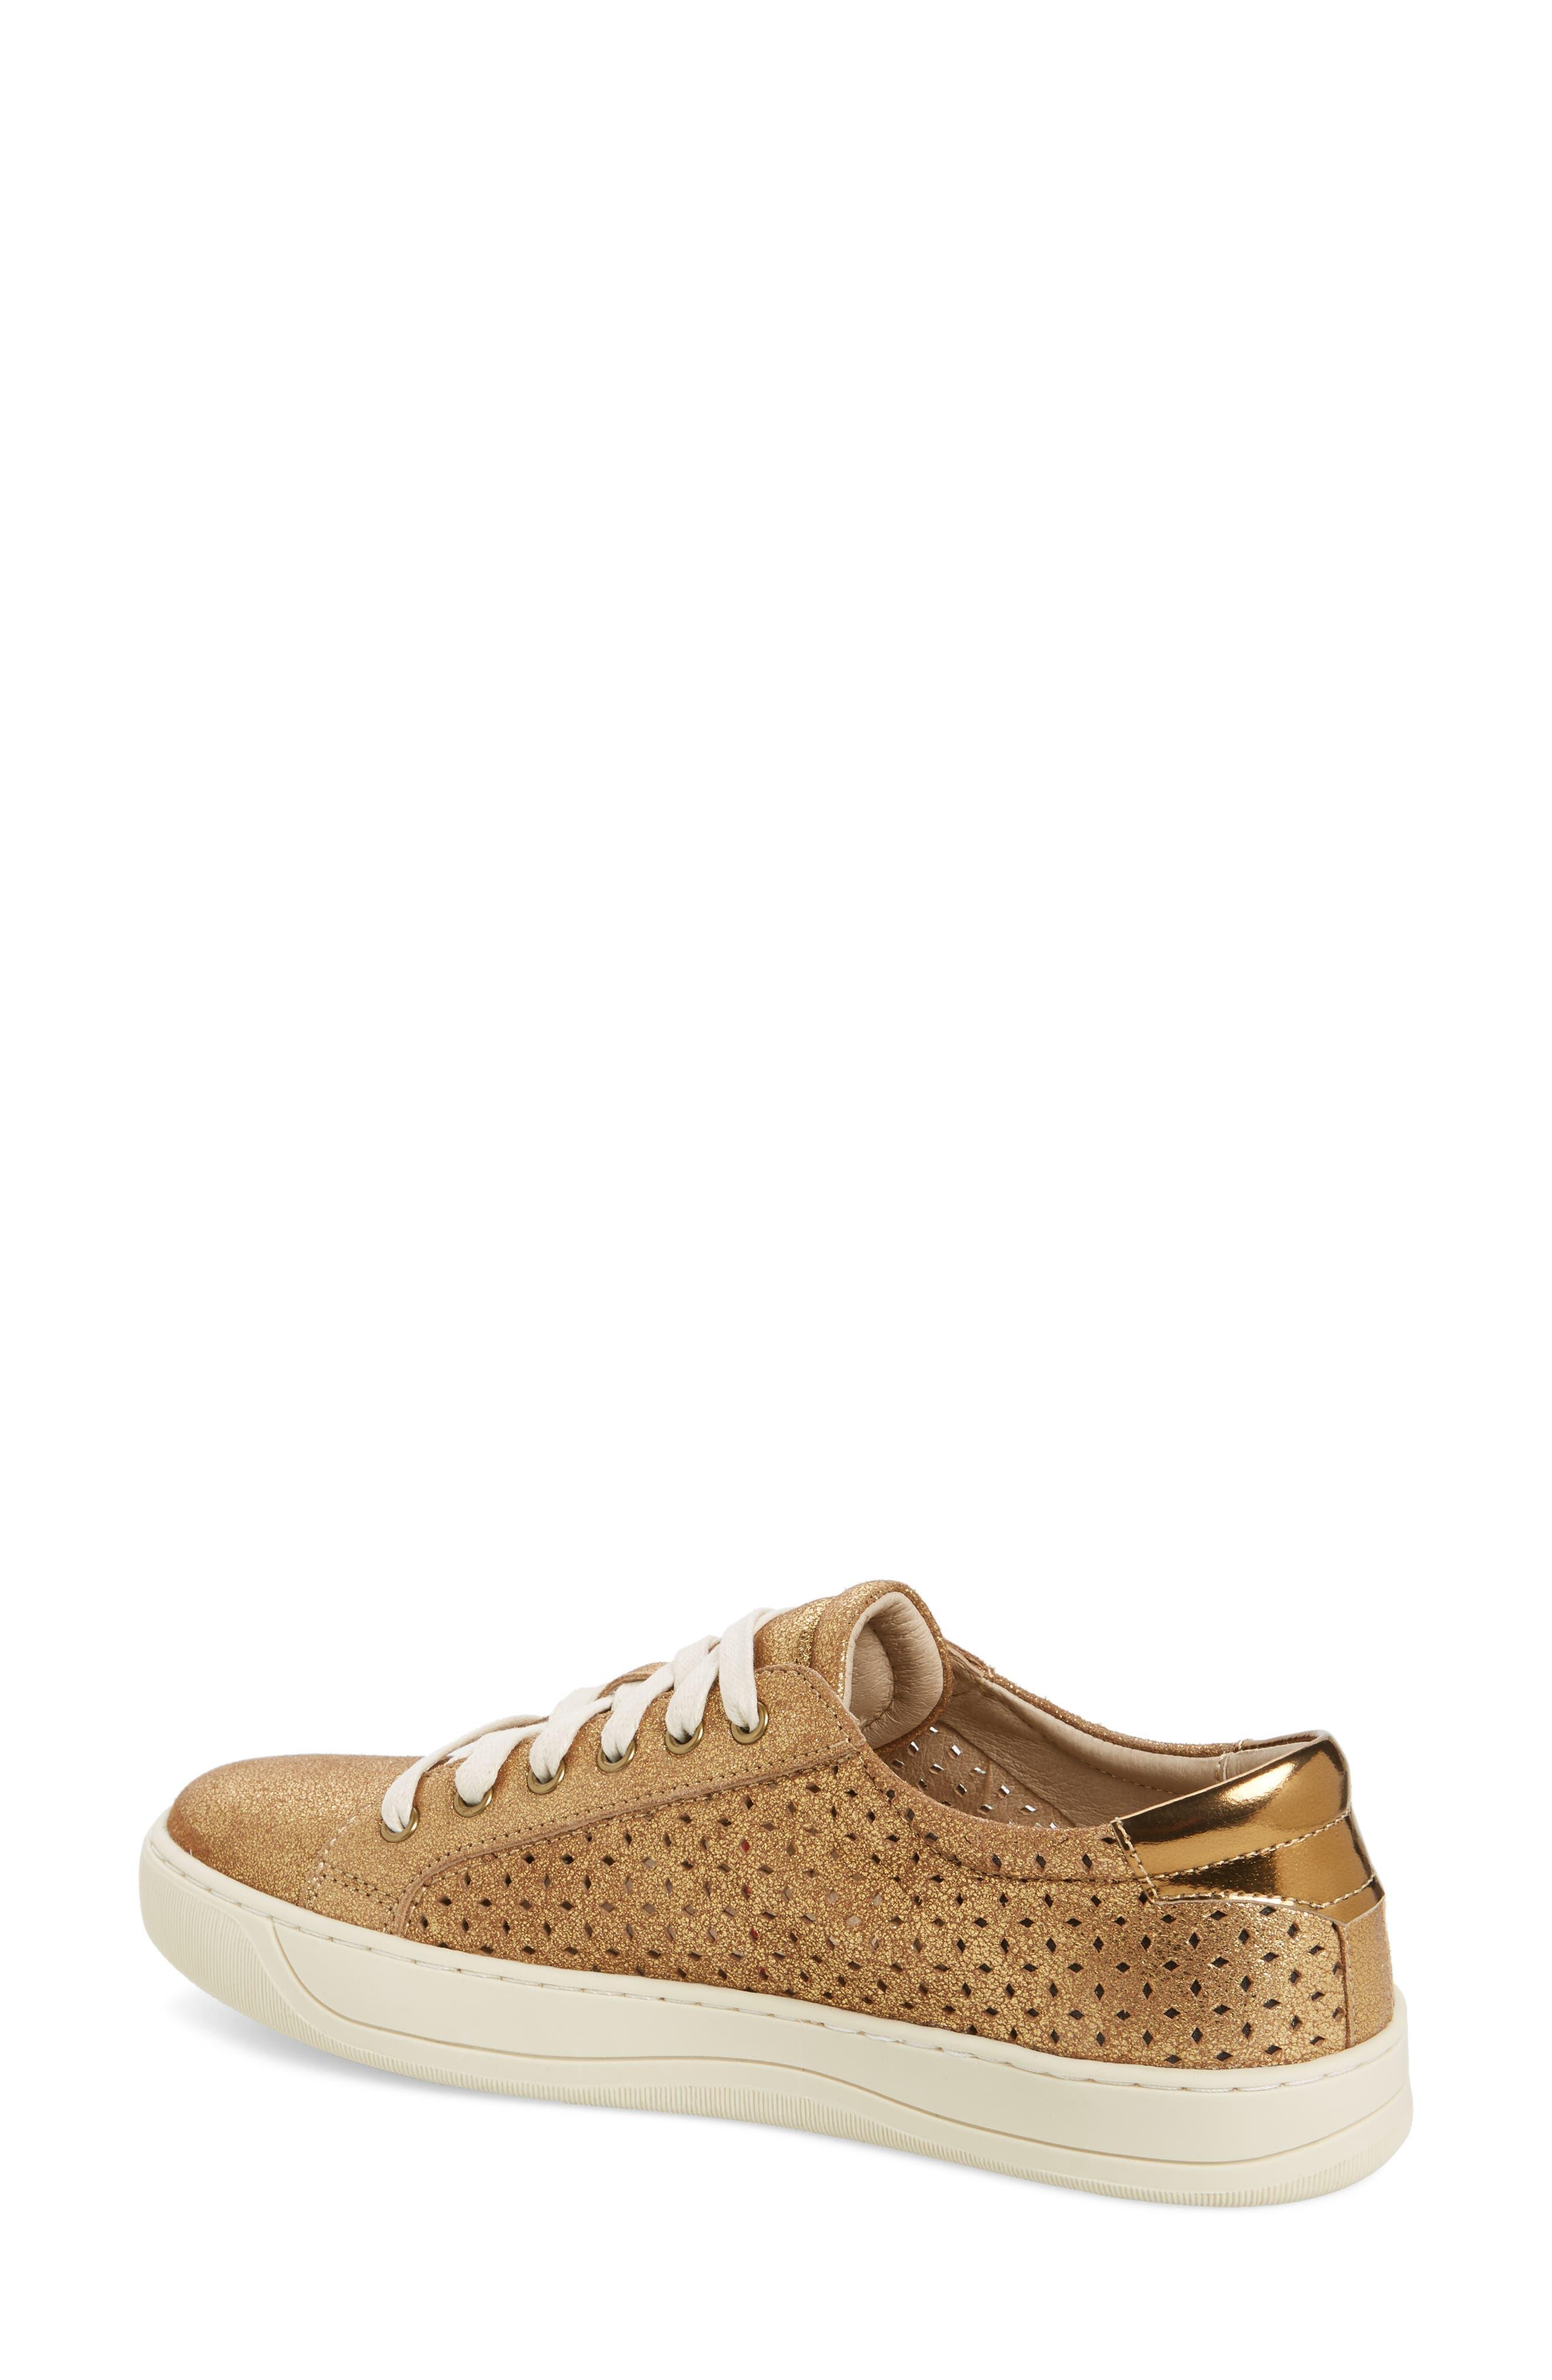 Alternate Image 2  - Johnston & Murphy Emerson Perforated Sneaker (Women)